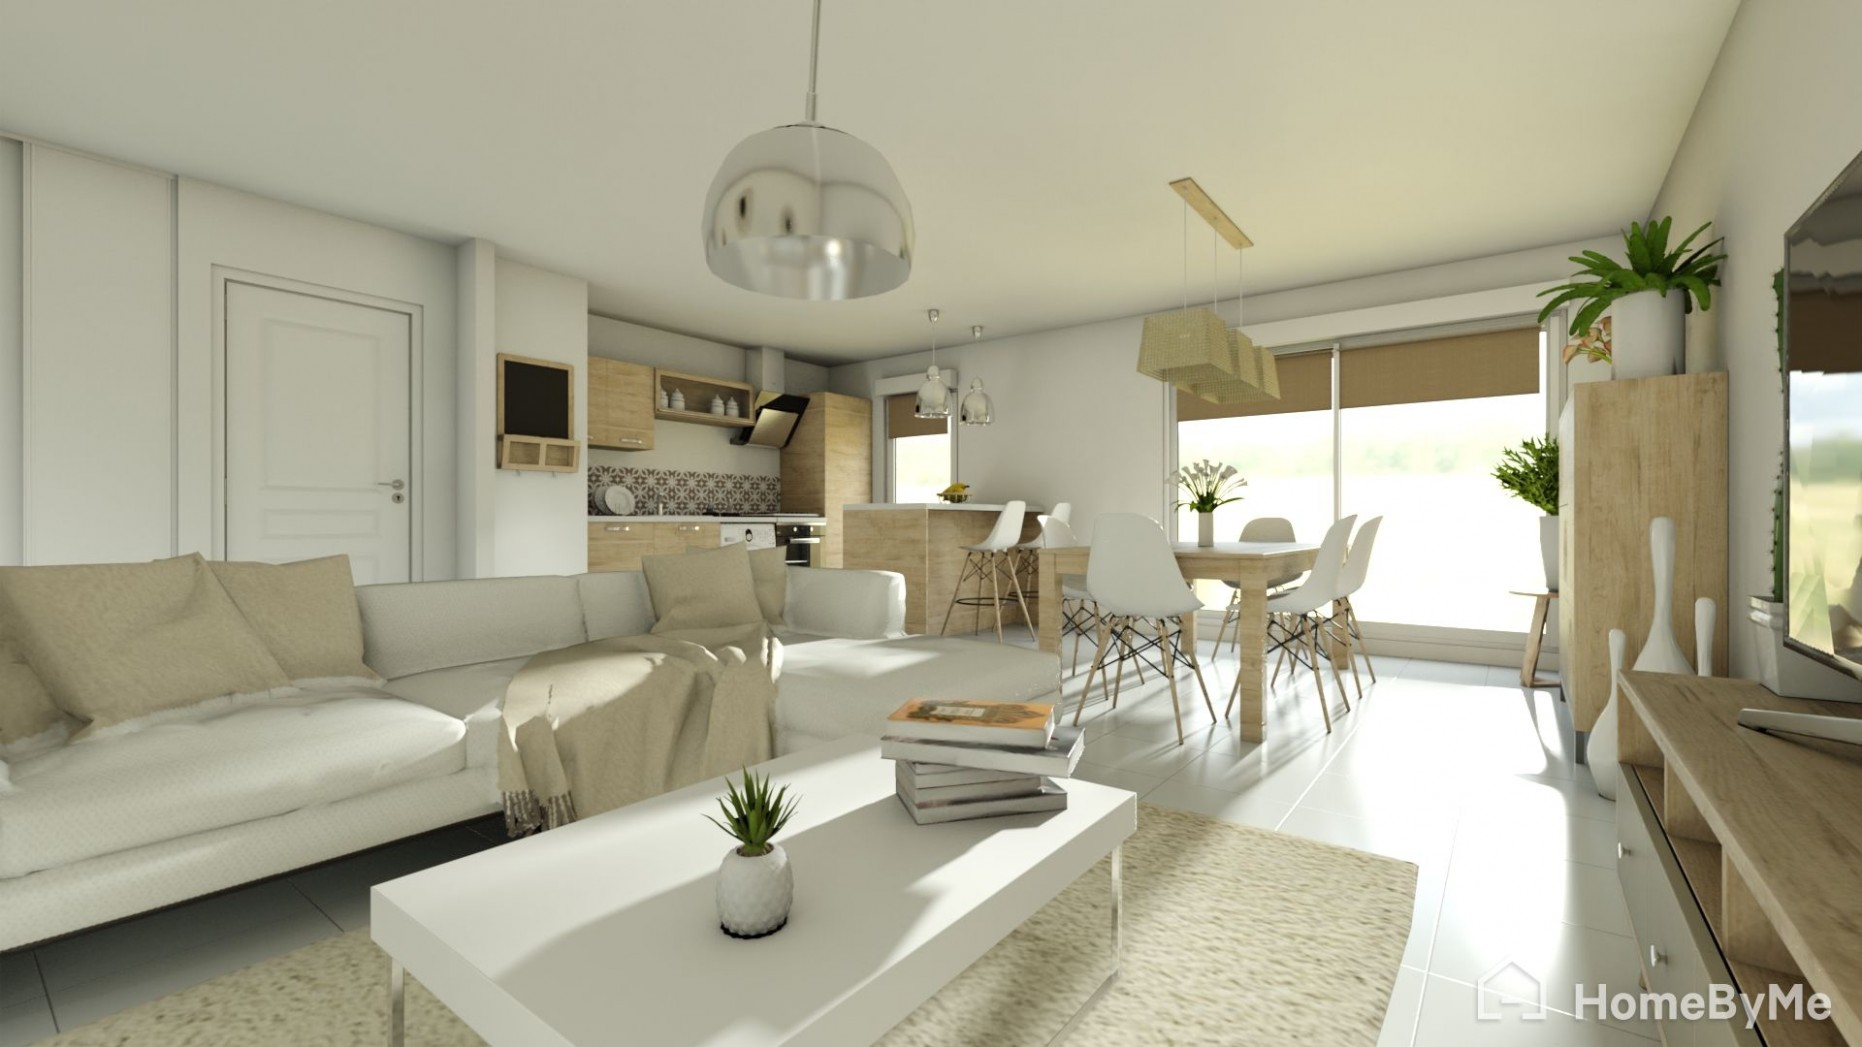 Free and online 9D home design planner - HomeByMe - Apartment Design Online